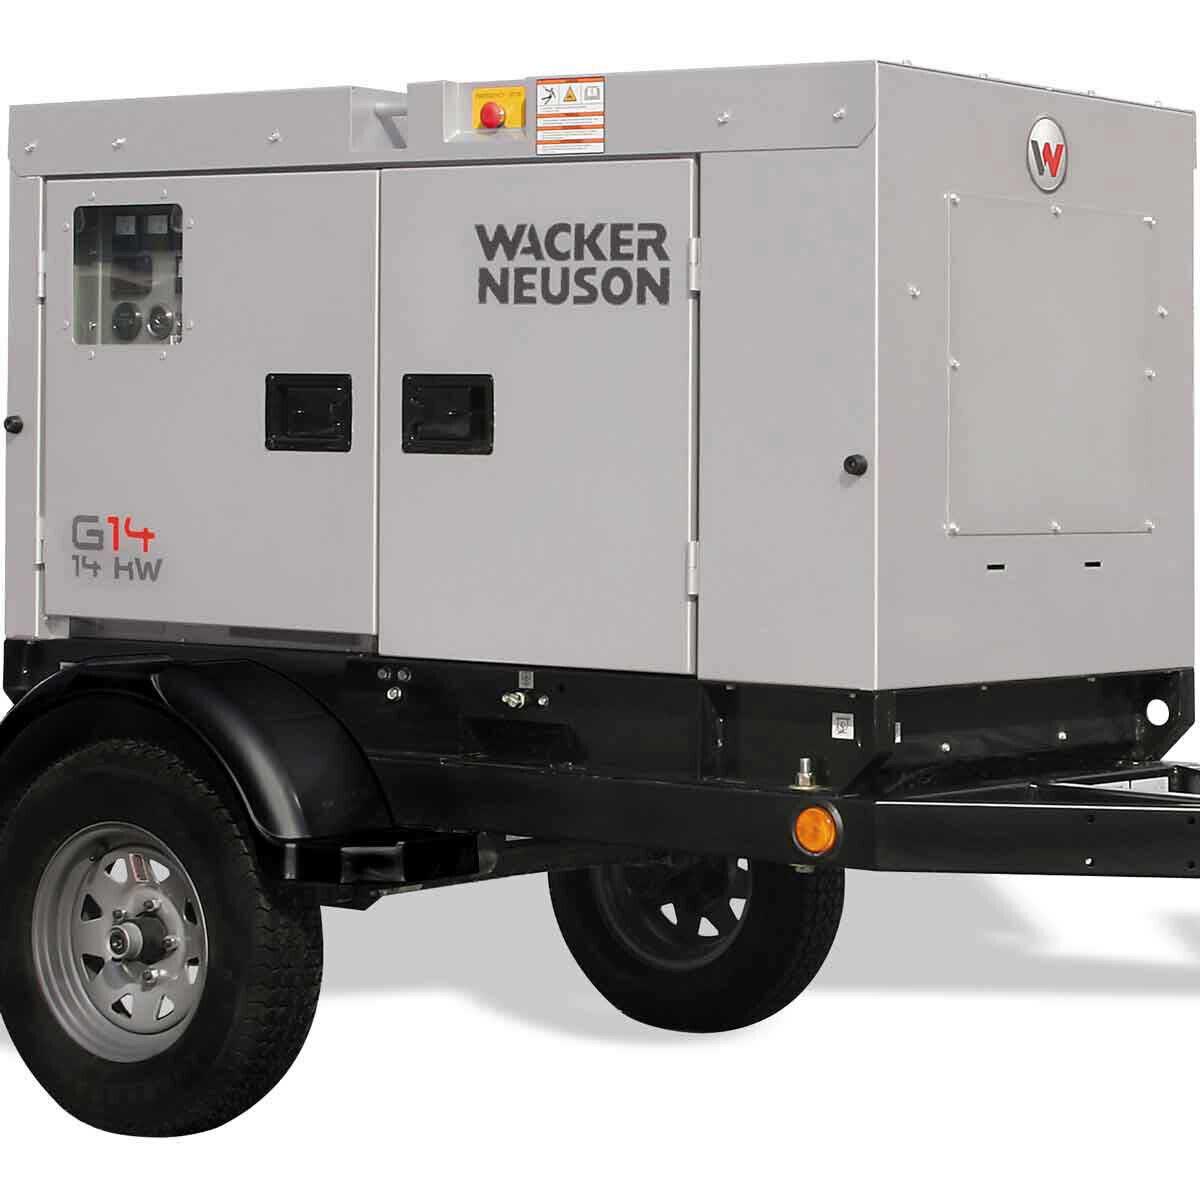 Wacker Neuson G 14 Generator Wheel Kit